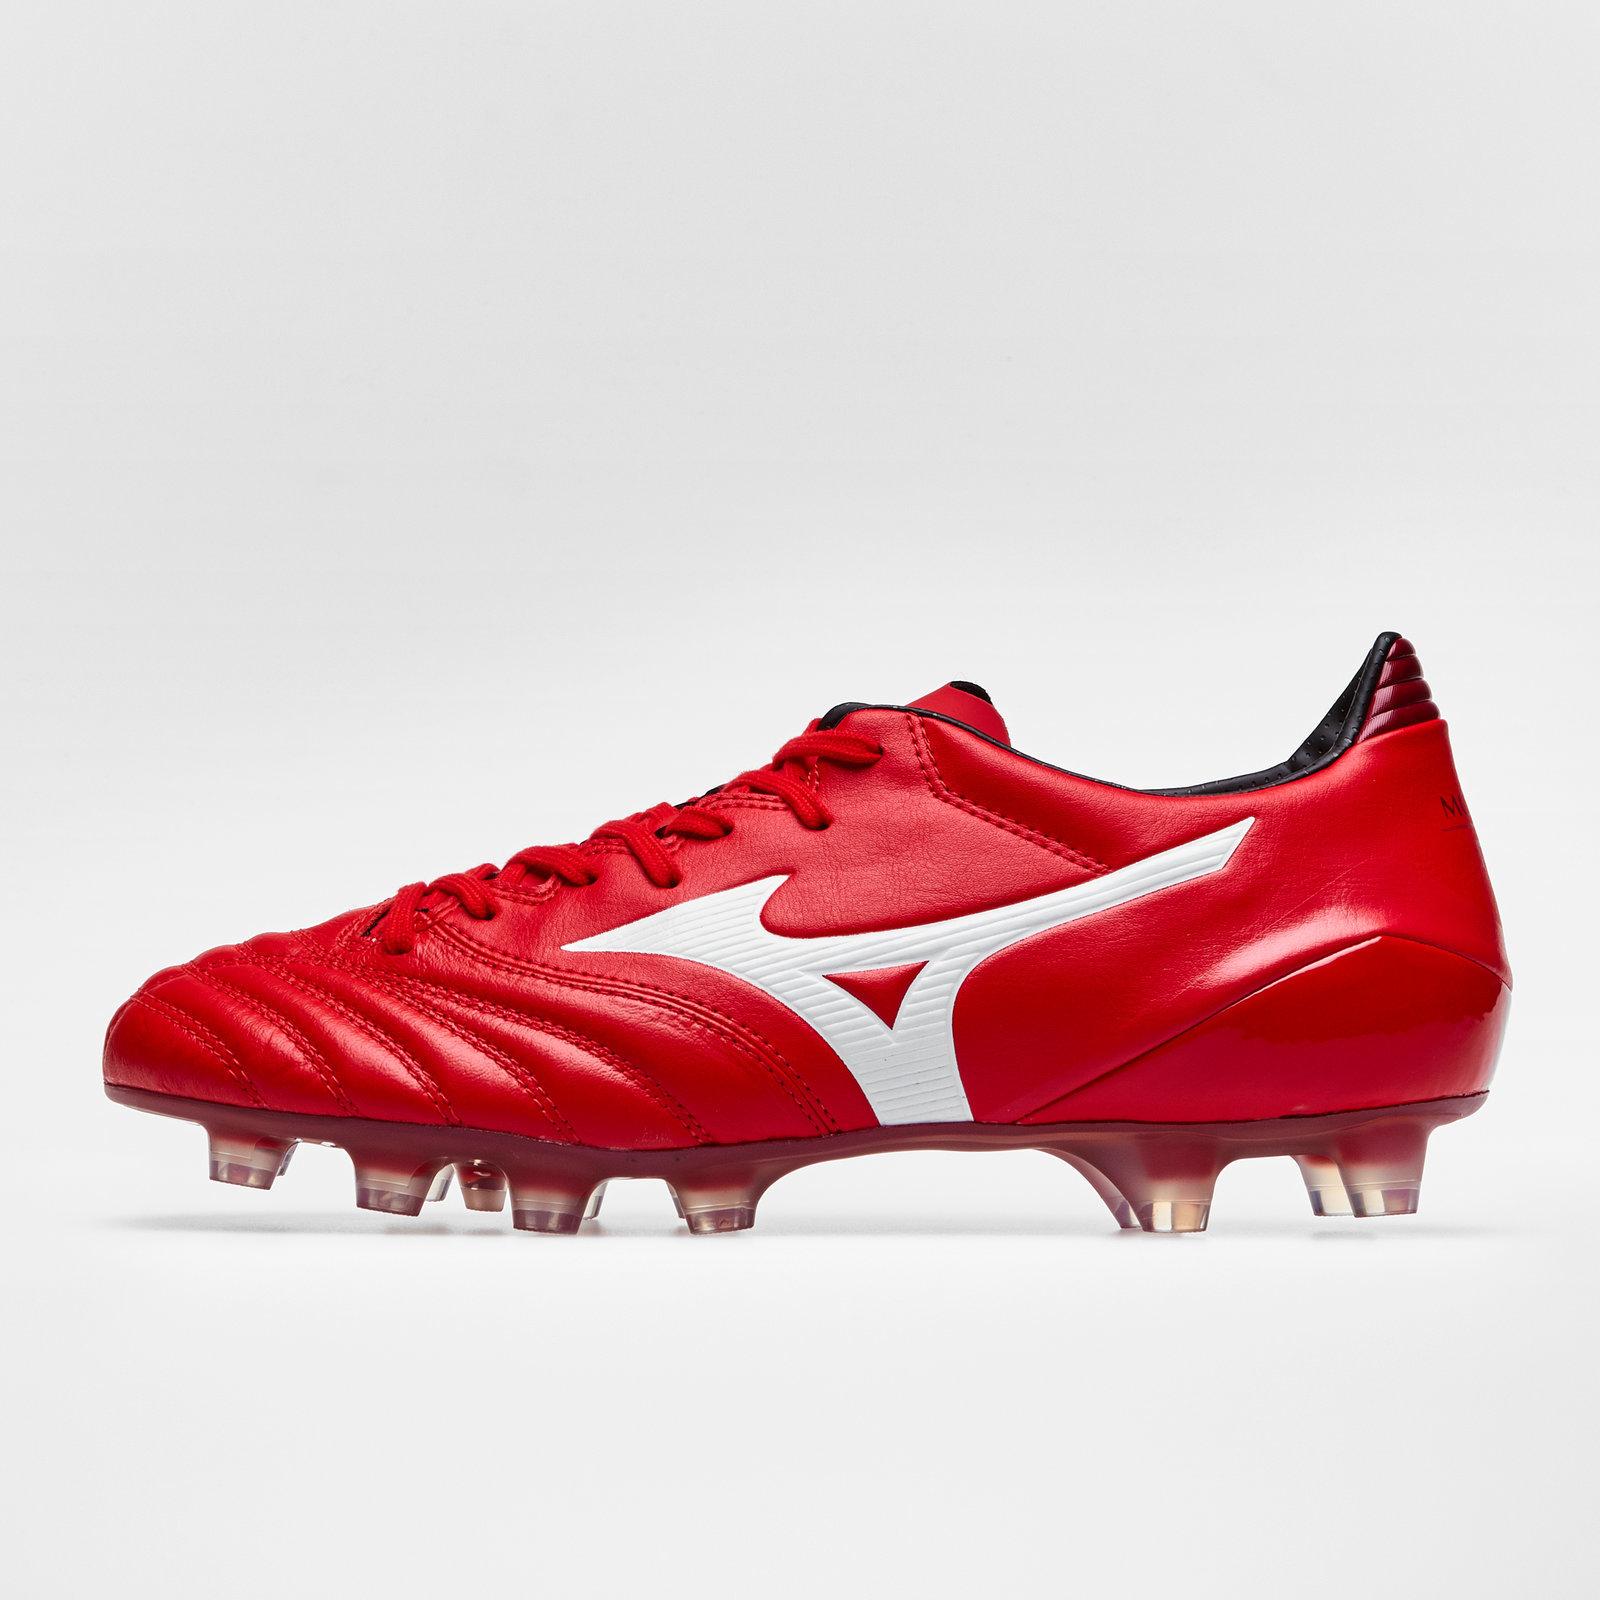 457cbe5ef Mizuno Morelia Neo Leather II MD FG Football Boots Image